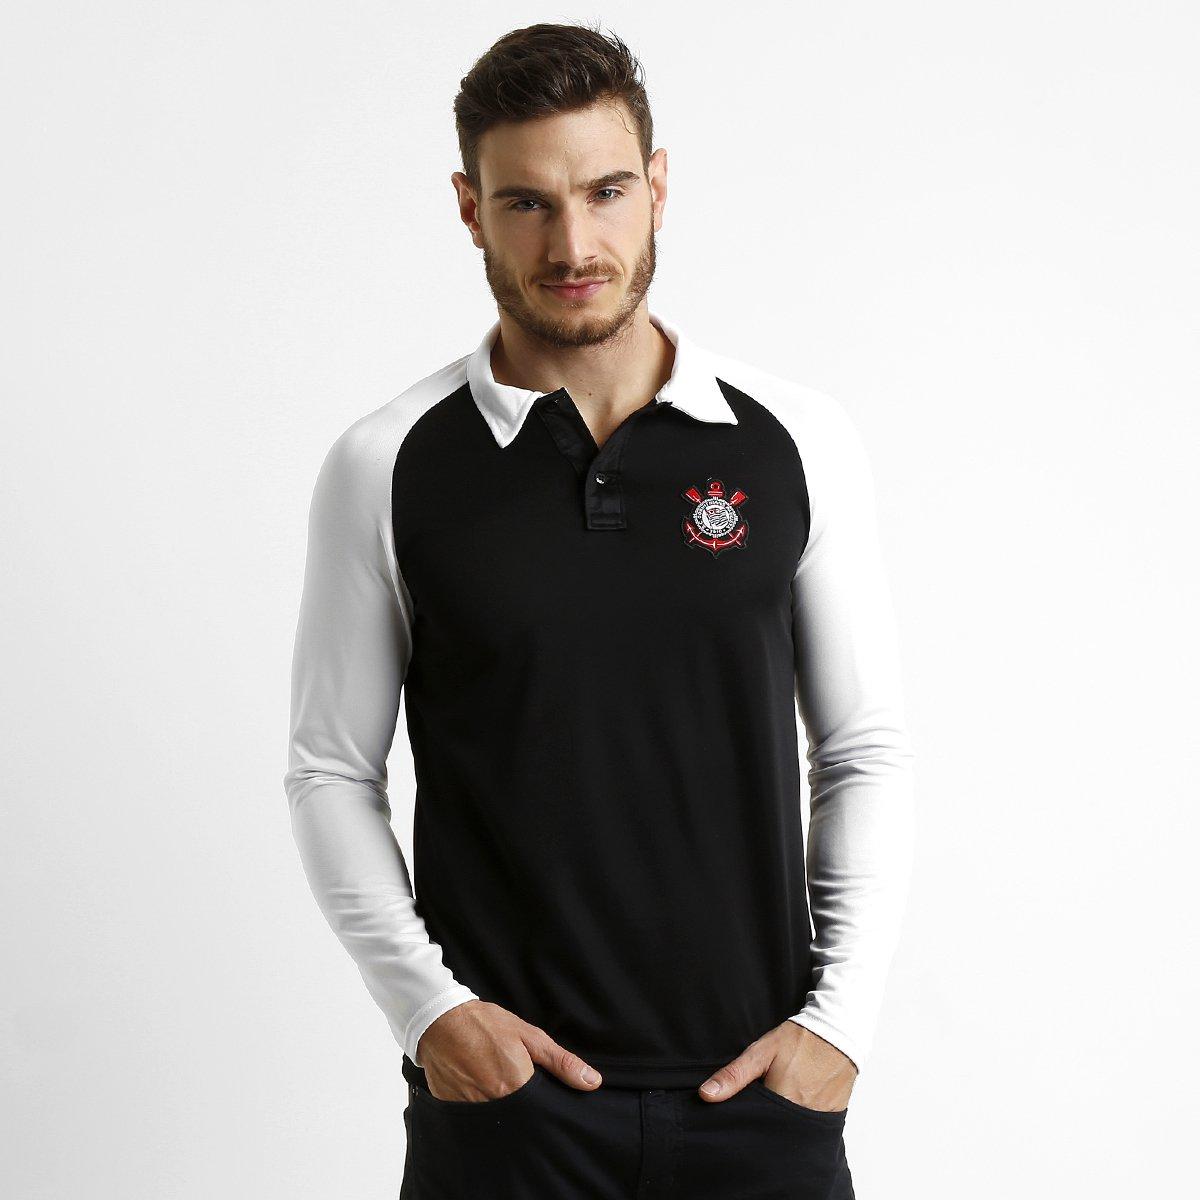 e5d6bed48fa0f Camisa Polo Corinthians M L Raglan - Compre Agora